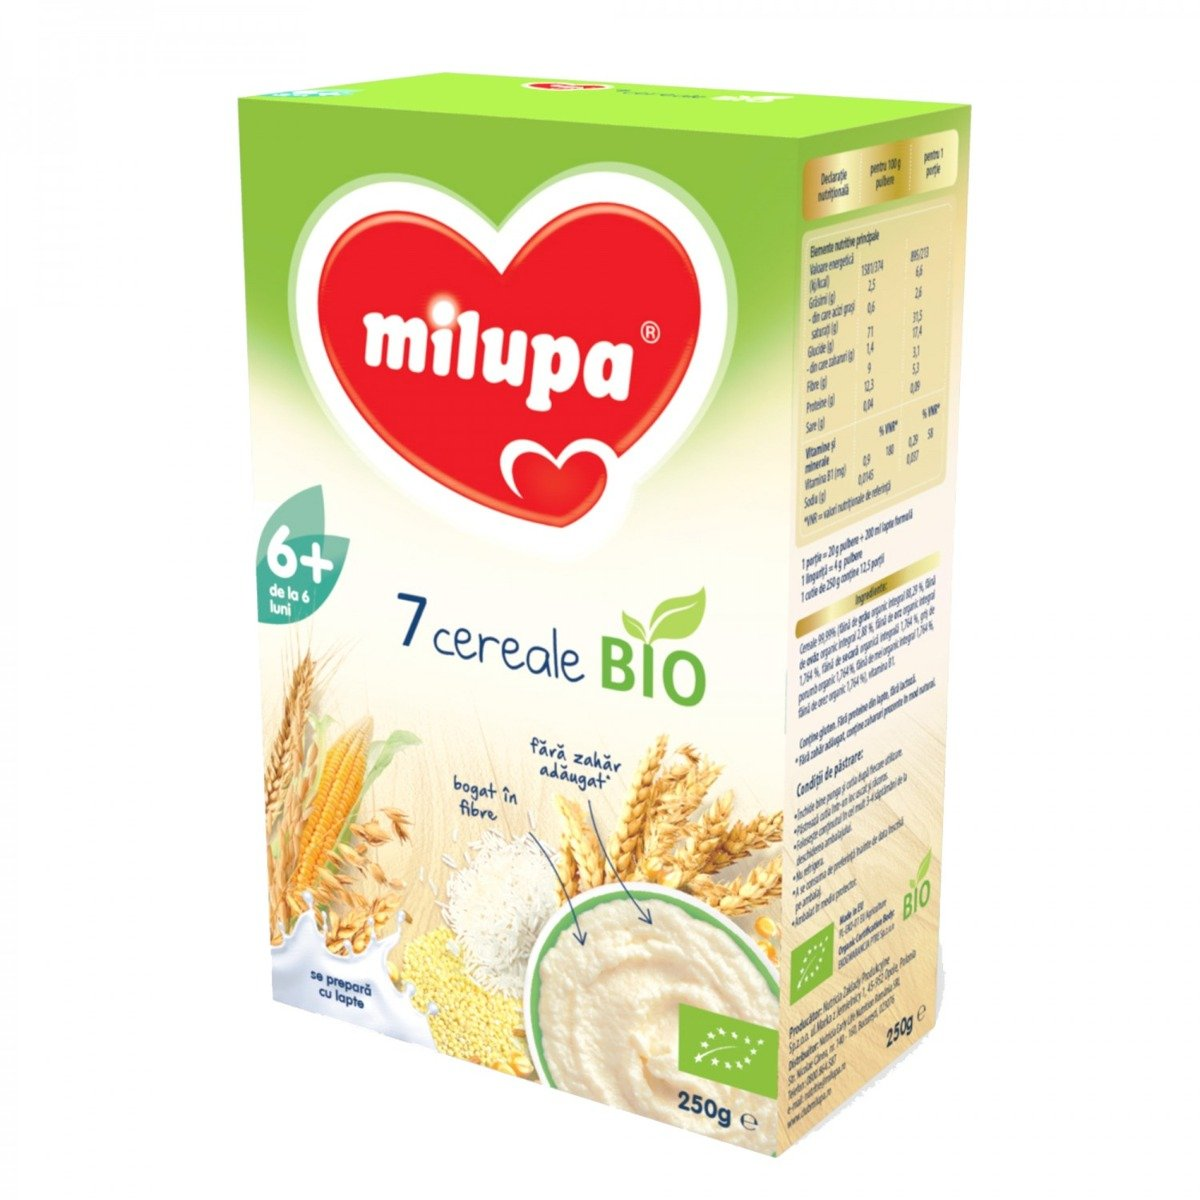 Cereale Milupa - 7 cereale, 250g